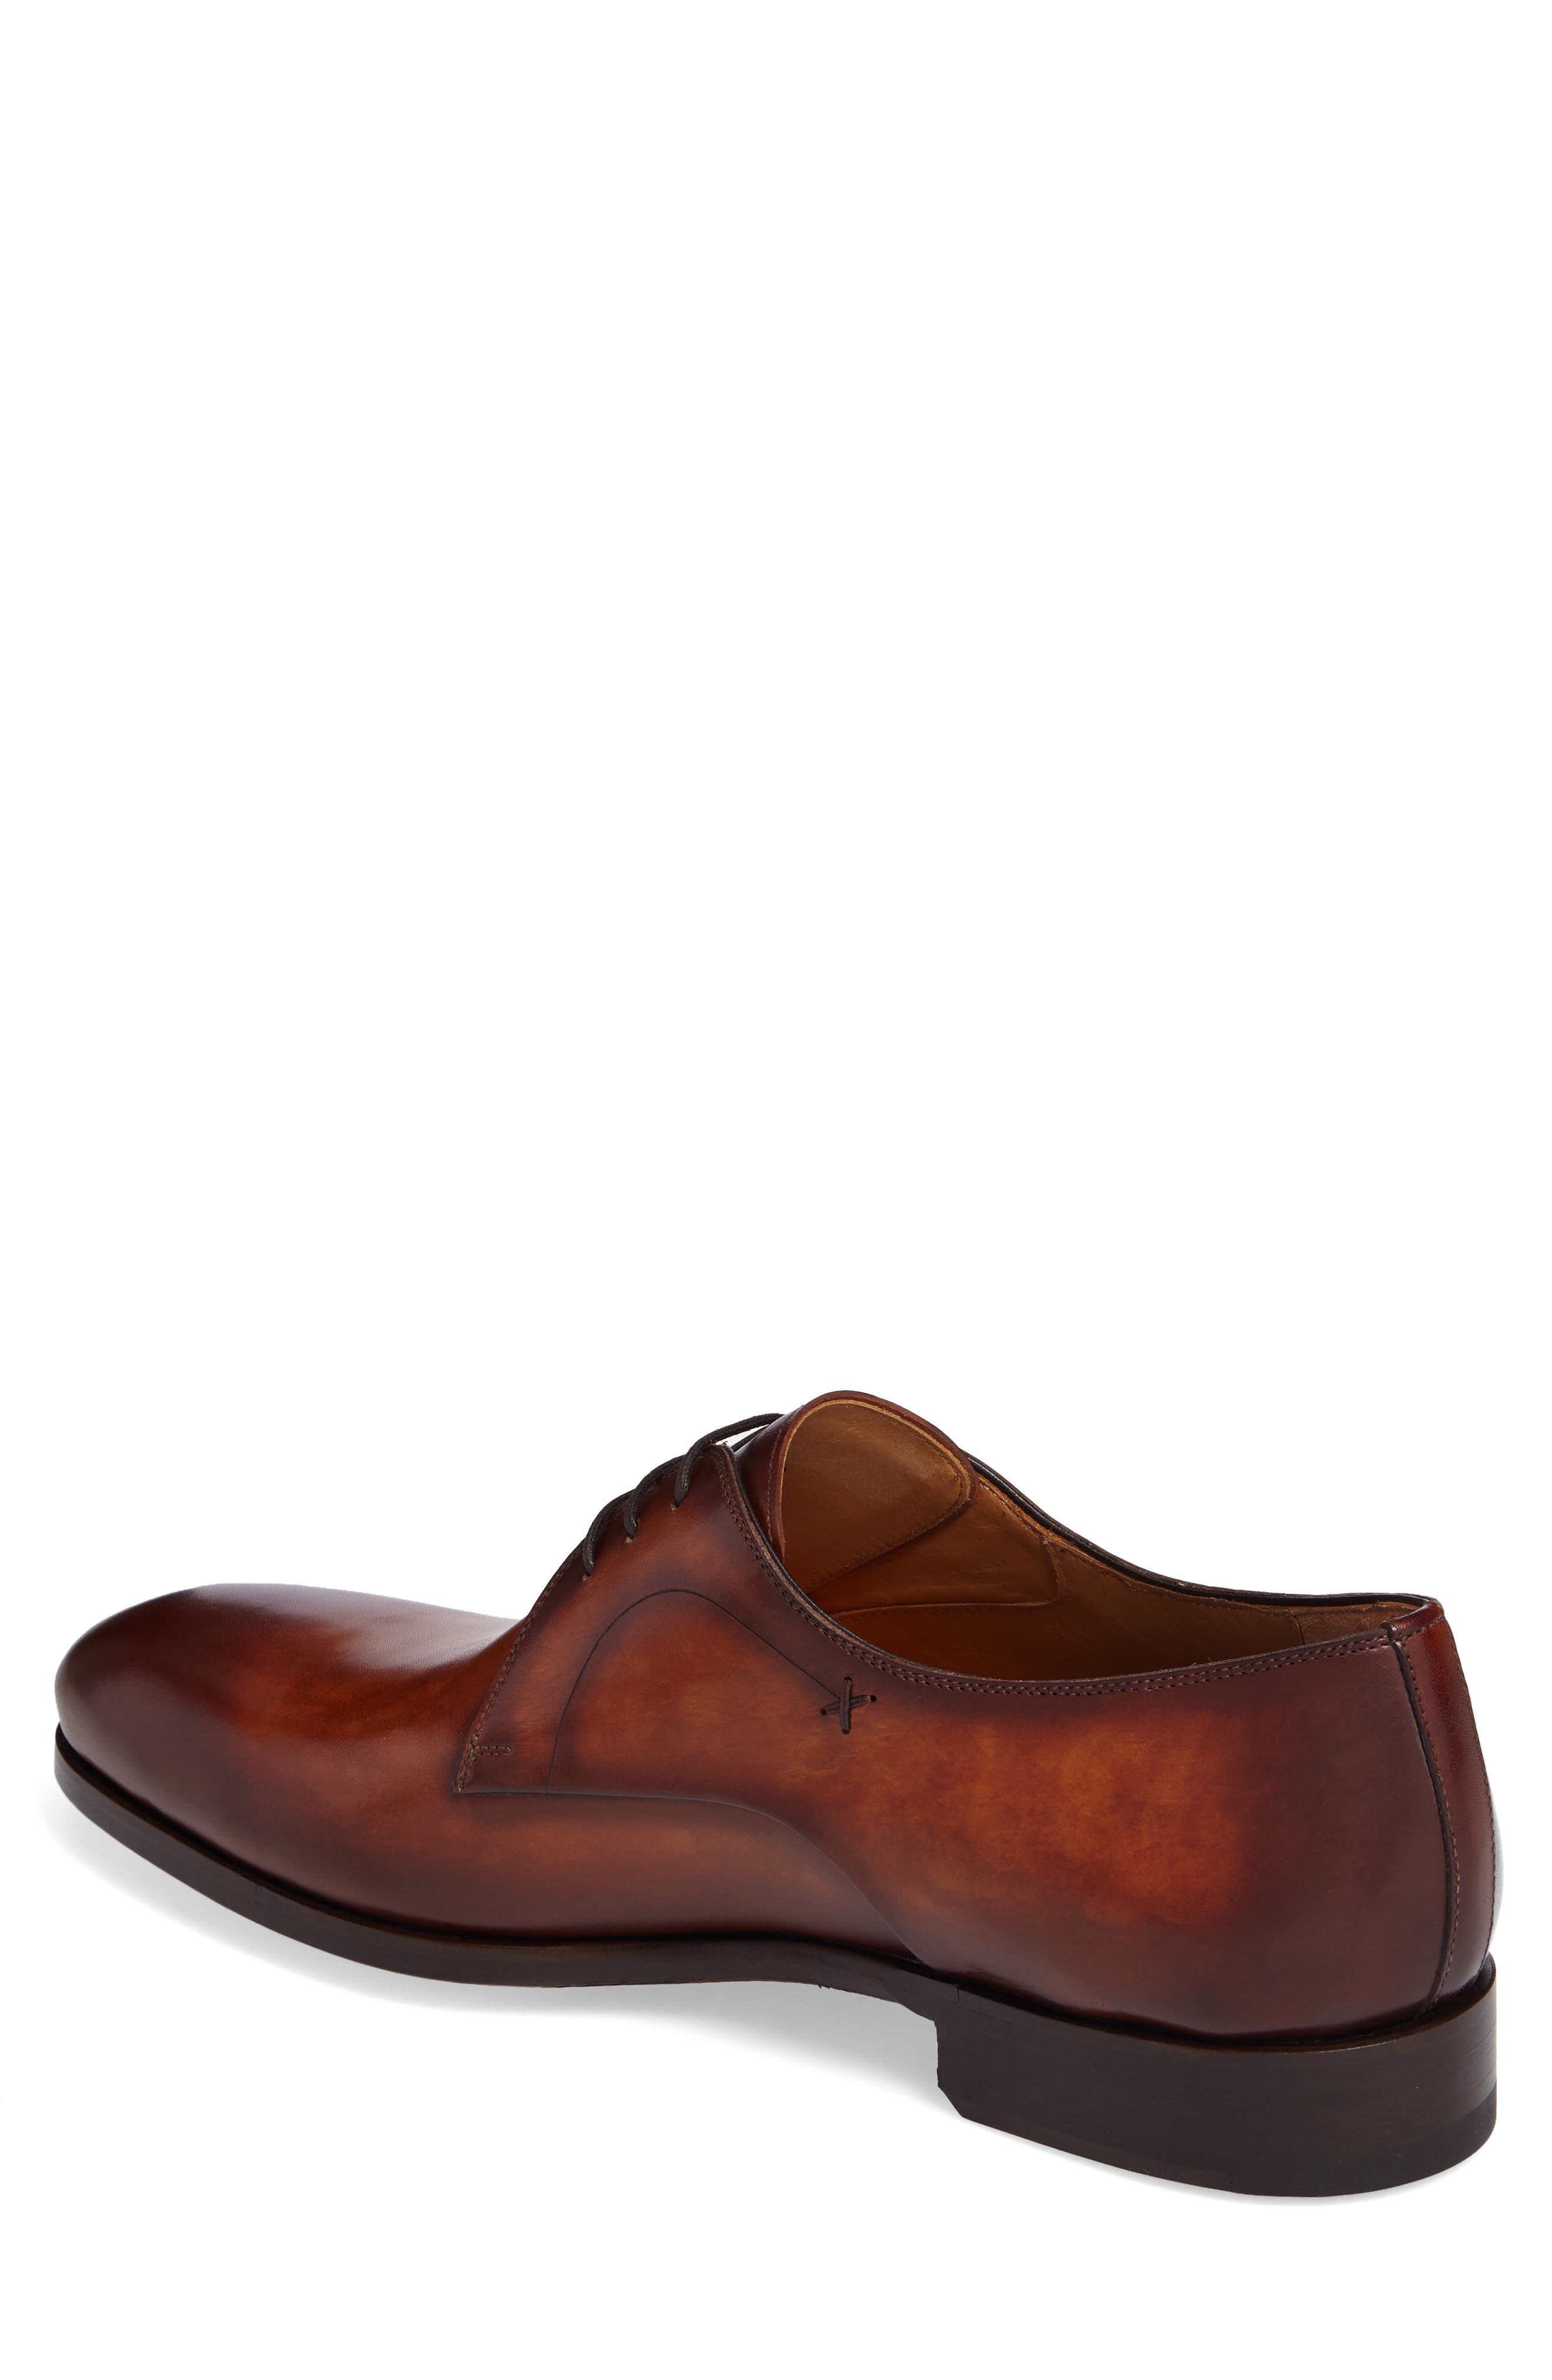 Alternate Image 2  - Magnanni Mana Plain Toe Derby (Men)